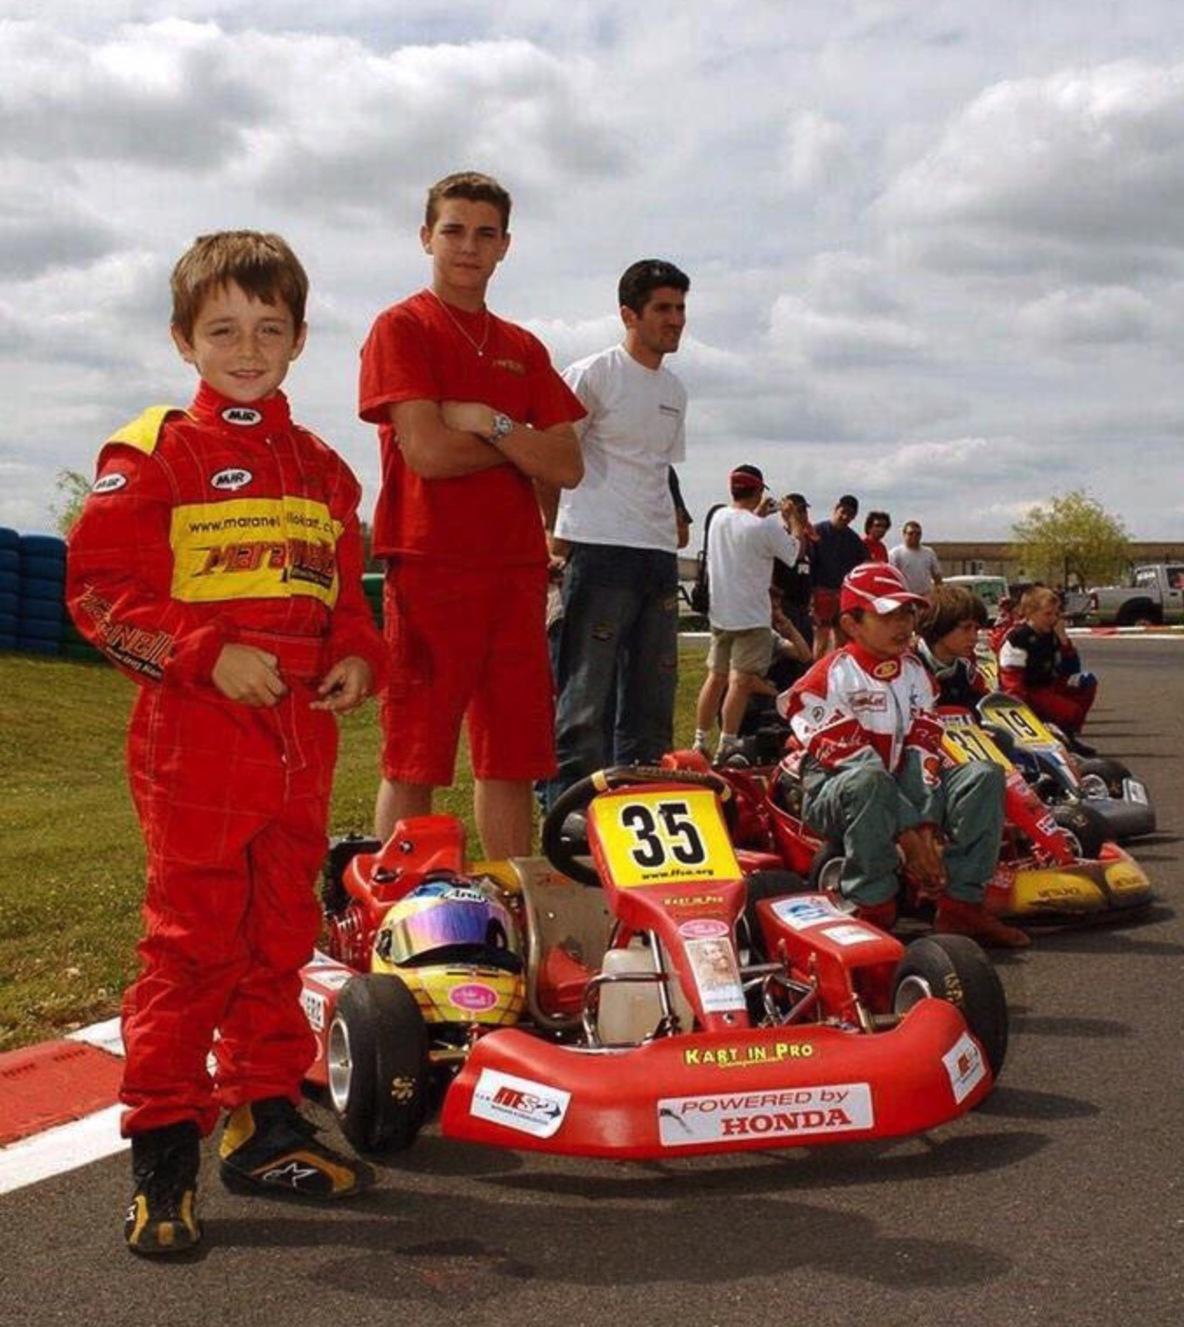 08-Charles-Leclerc.jpg